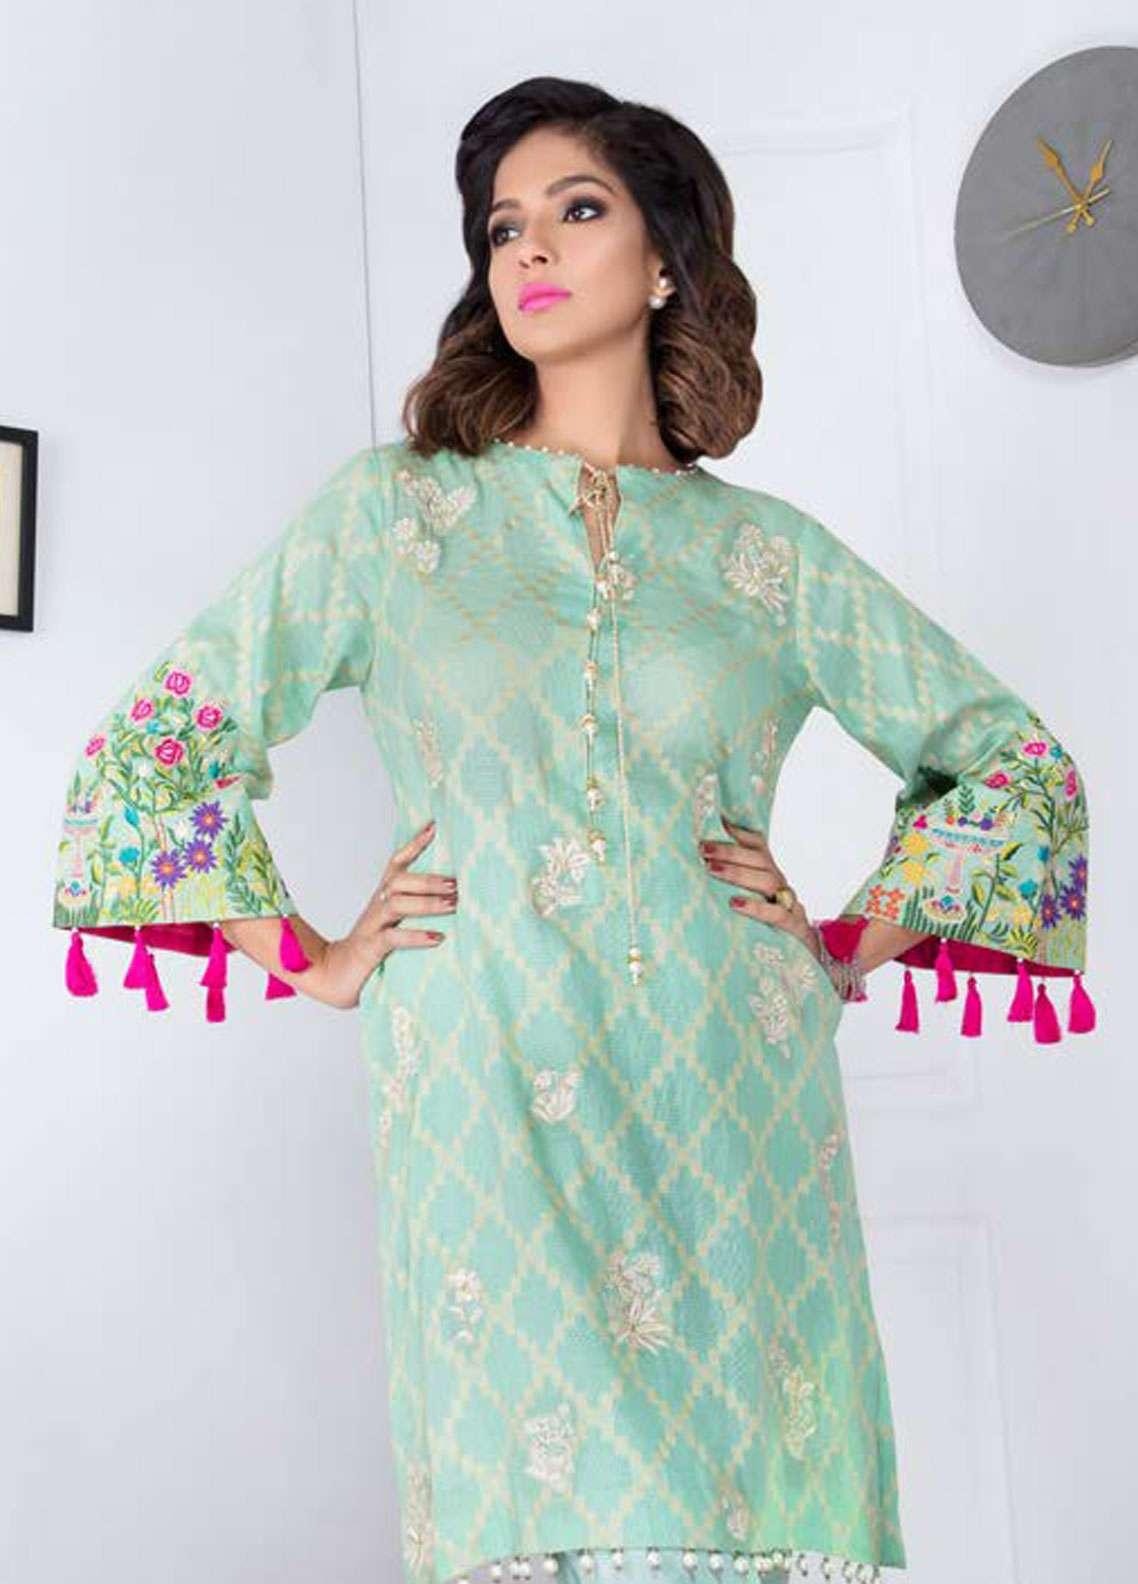 Takhleek By Hijab Omer Embroidered Jacquard Stitched Kurtis Angan TK-1804 Turquoise